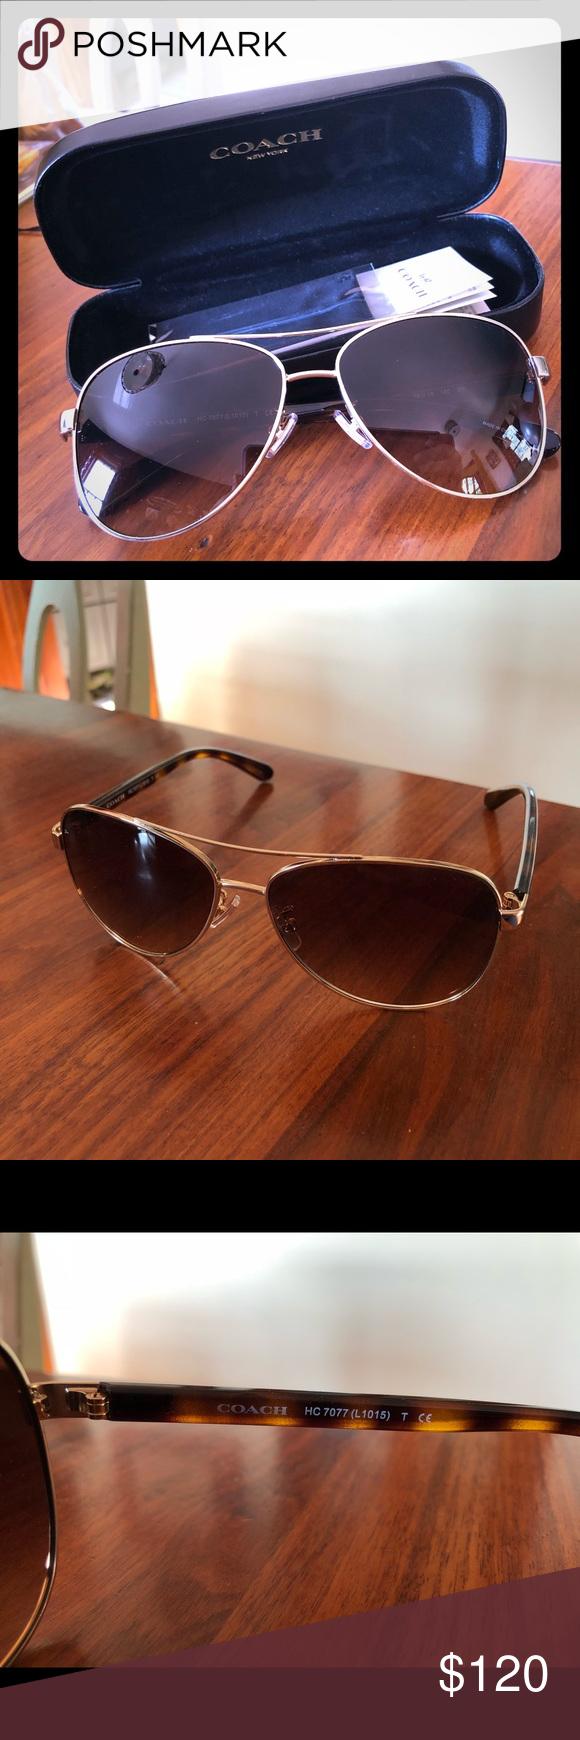 e1fe019e44 NEW Coach Gold Tortoise Aviator Sunglasses Brand New